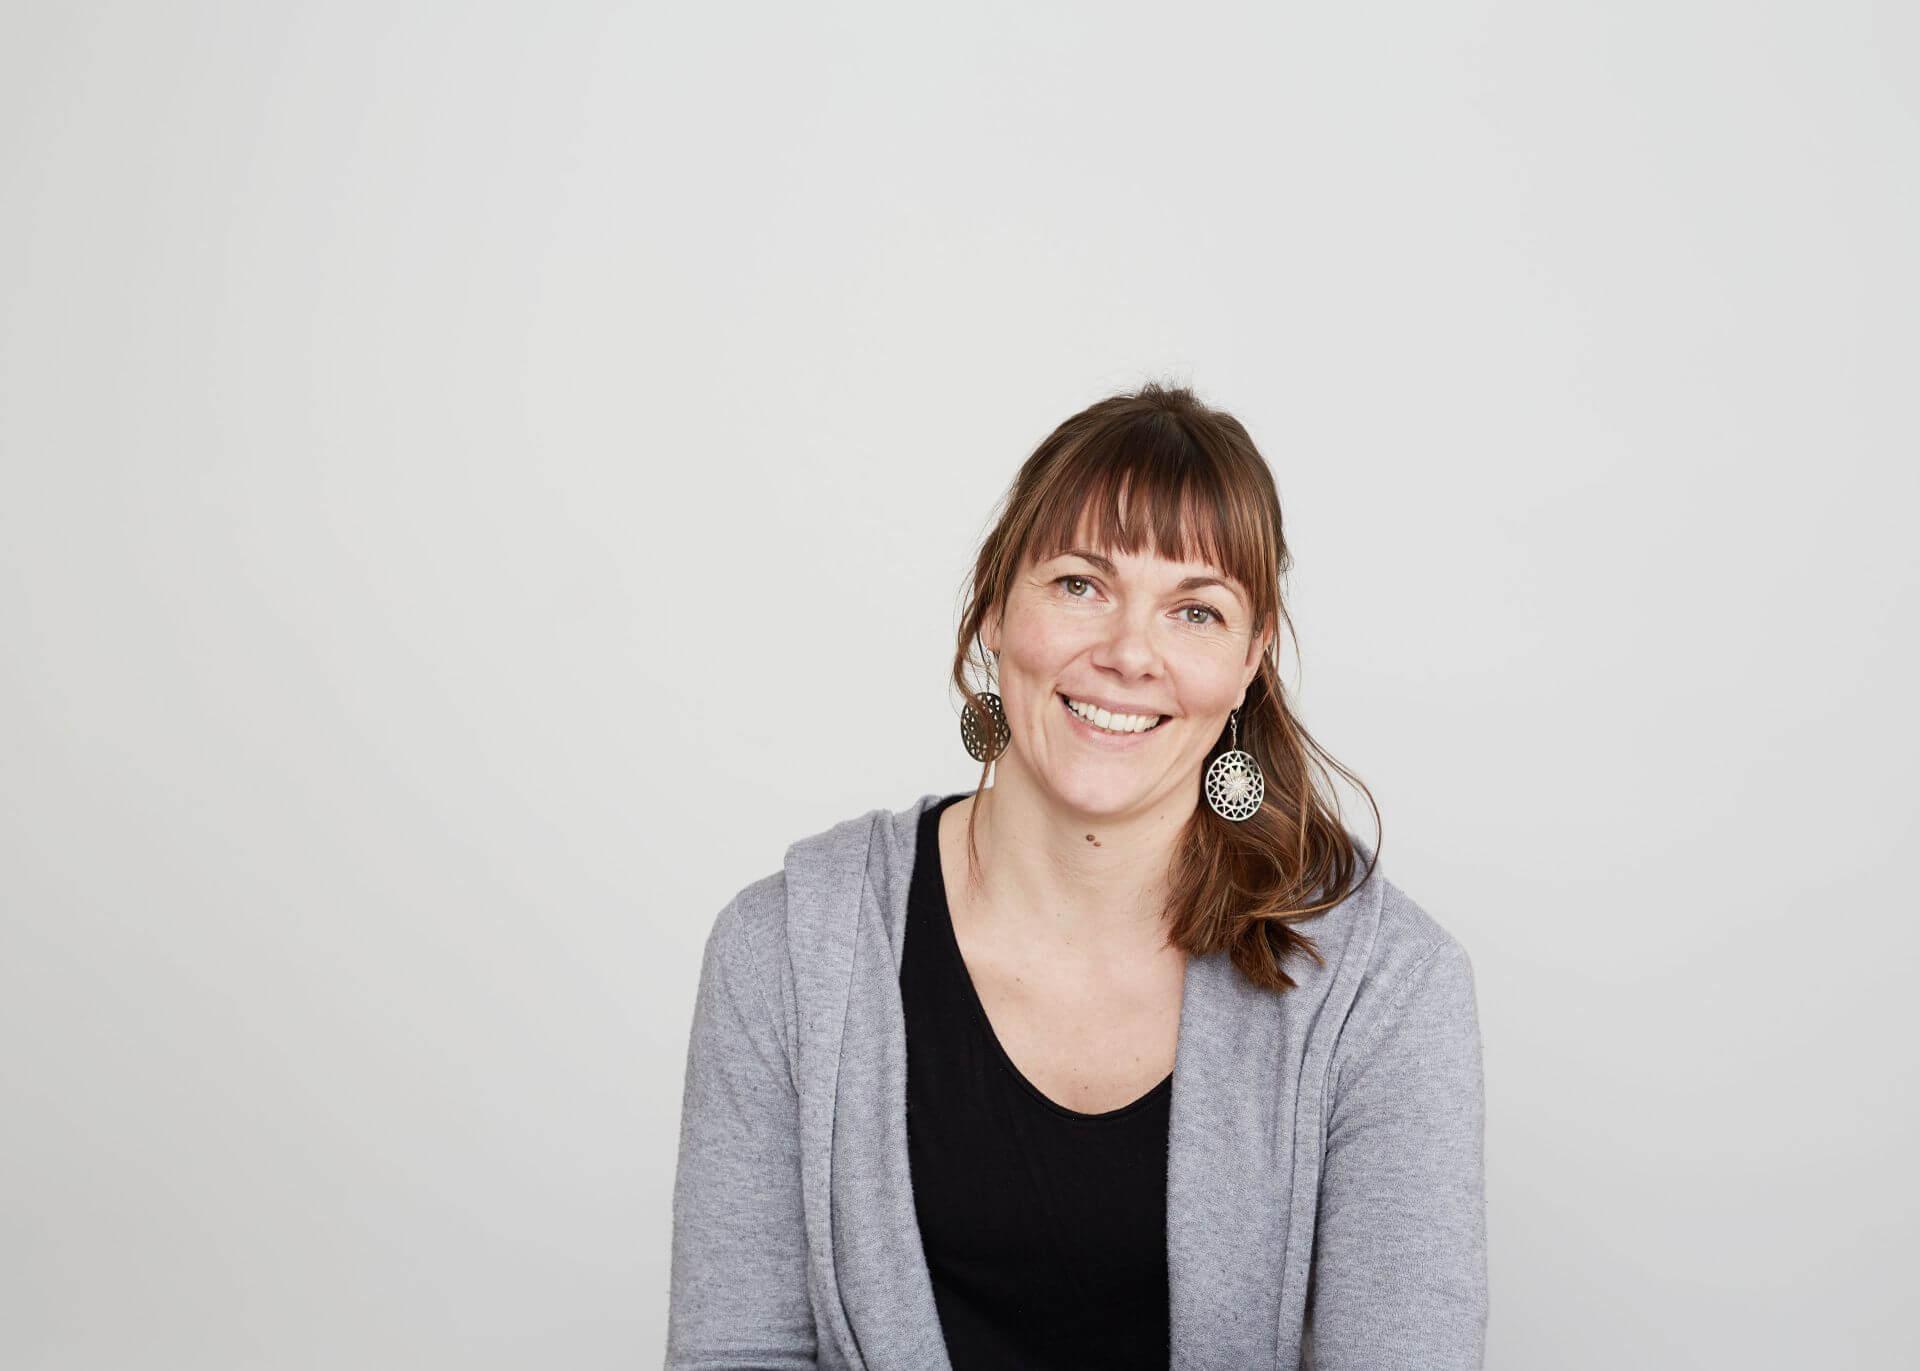 yogafrau - Elisabeth Votypka